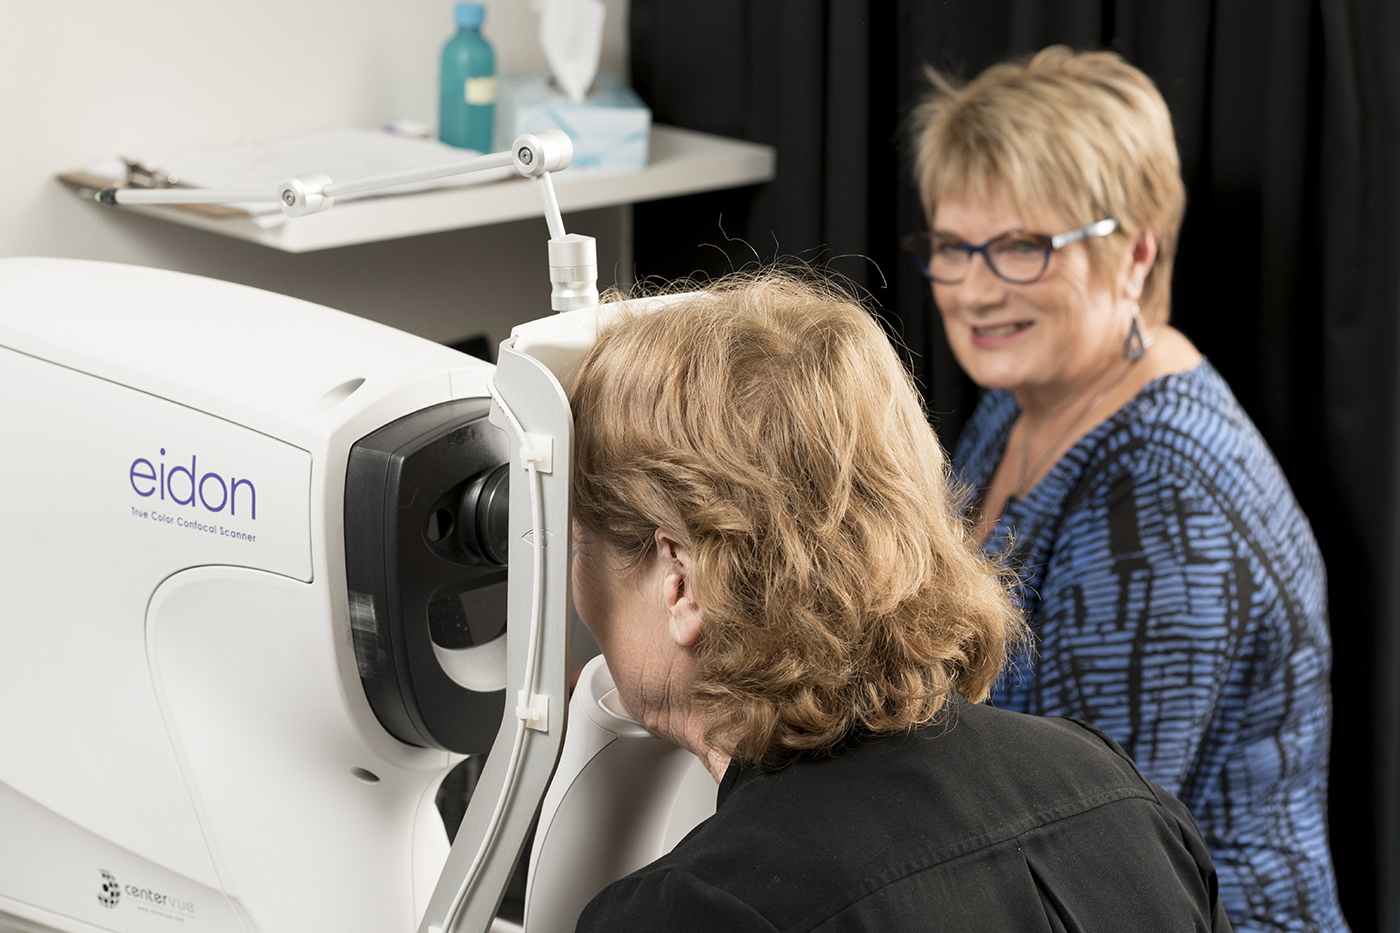 An eye examination at Shattky Optometrists